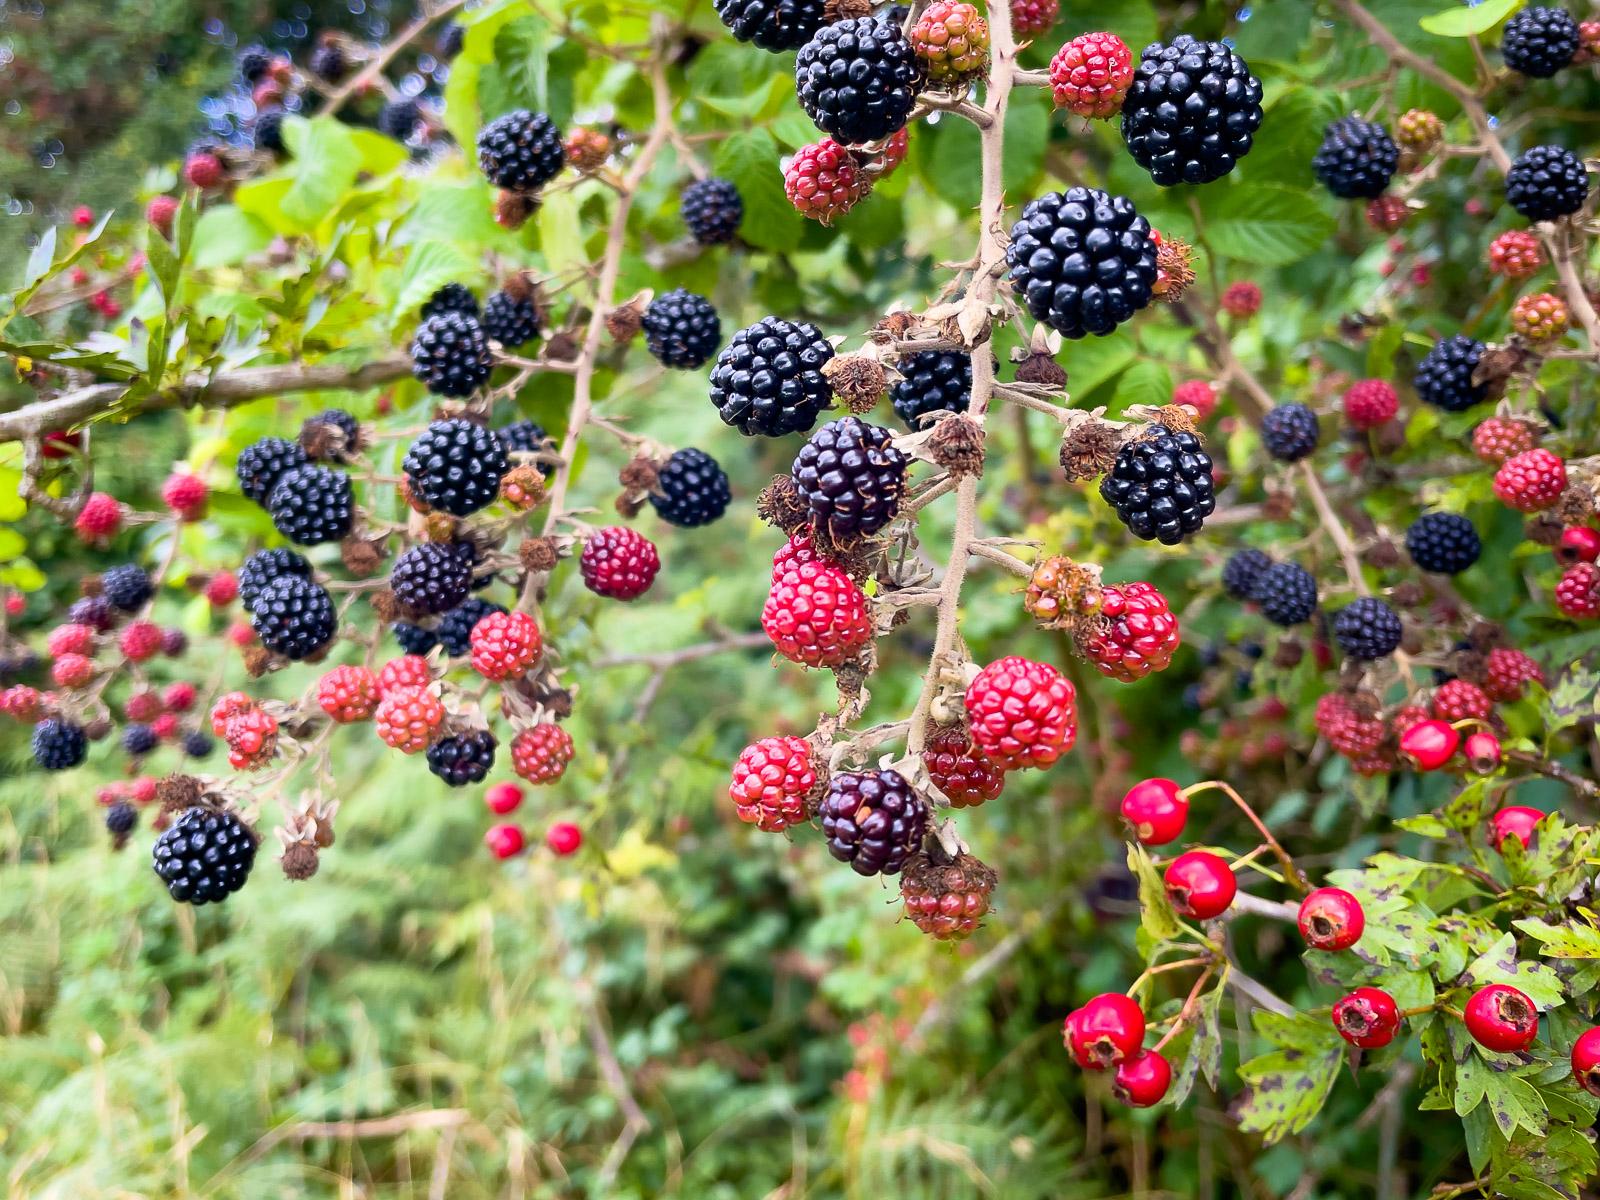 Blackberries - Lynchcombe, Mendip Hills, Somerset, UK. ID IMB_5578